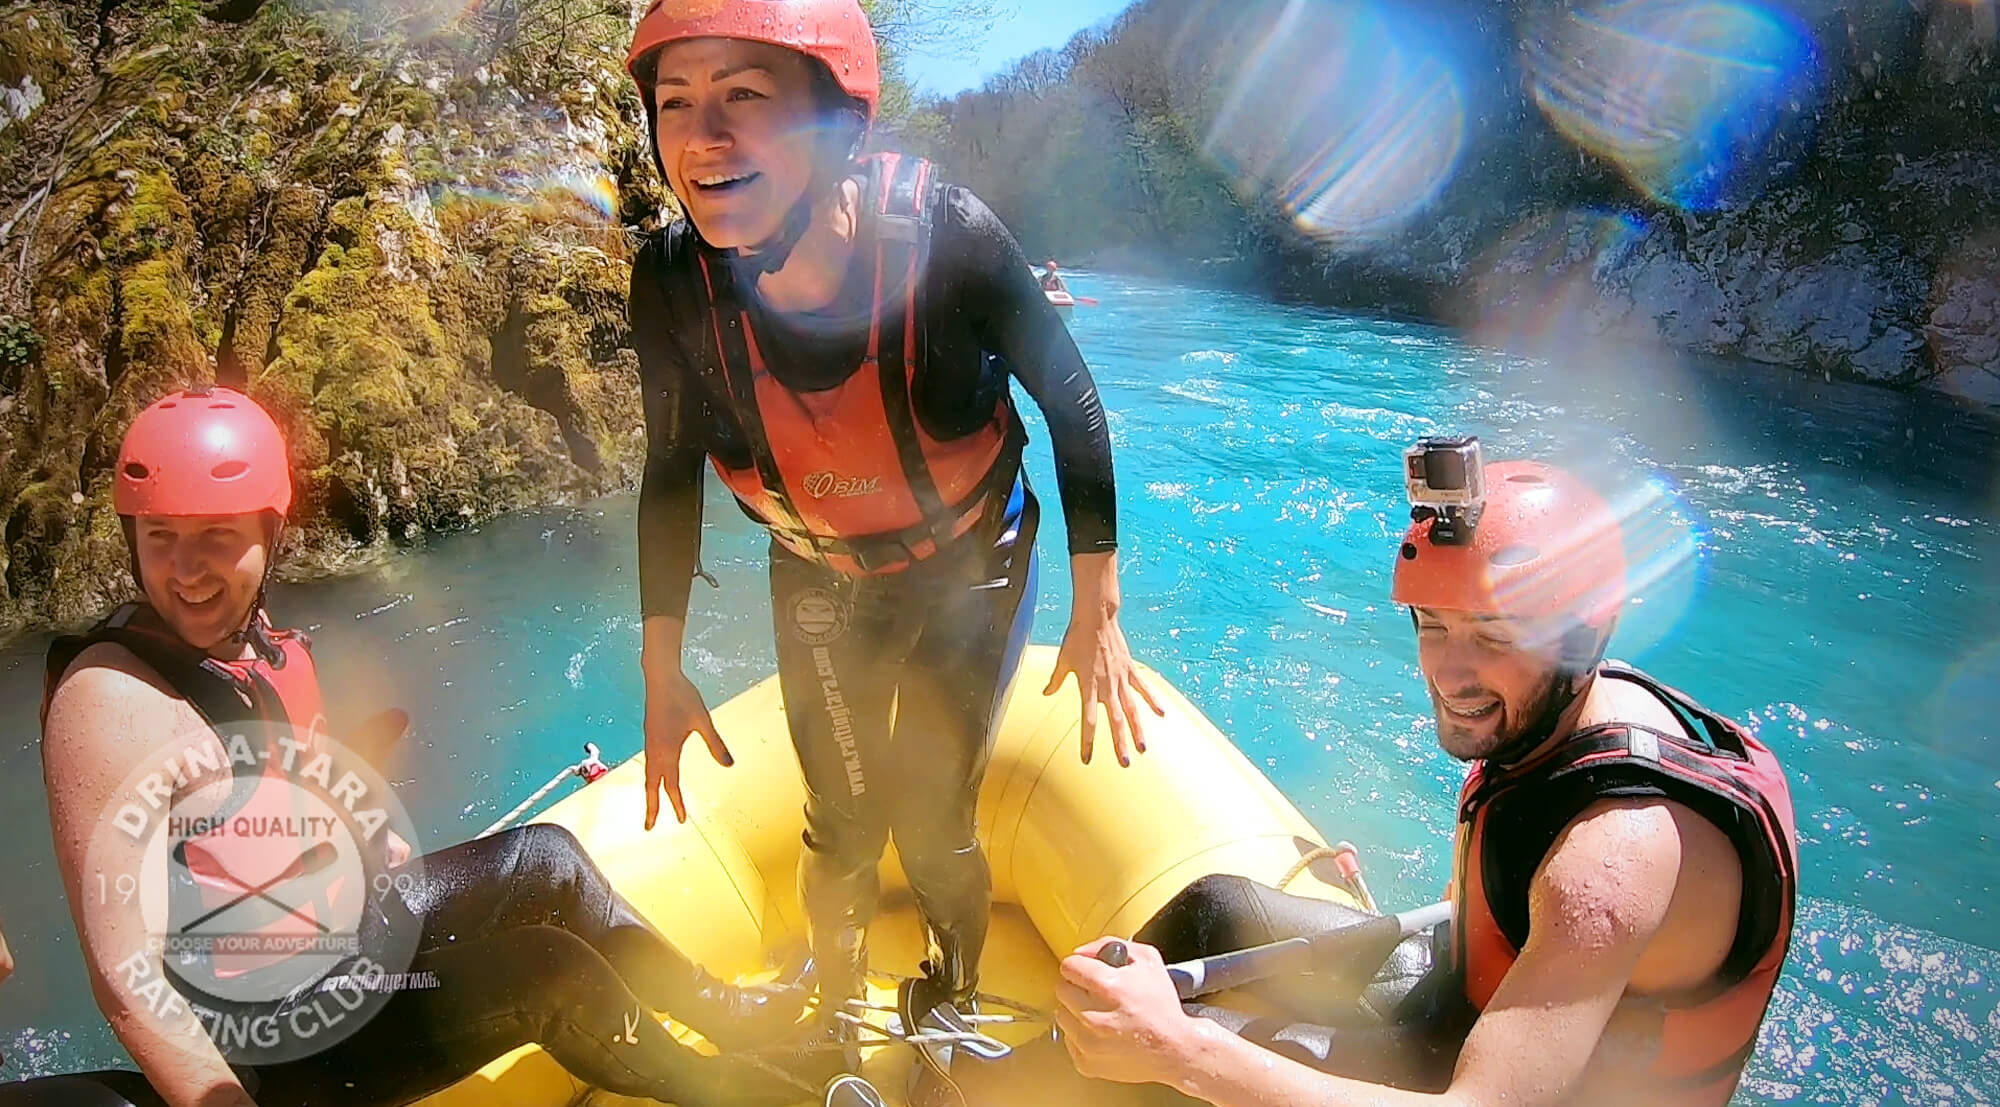 rafting centar drina tara, adrenaline rafting tara 2021